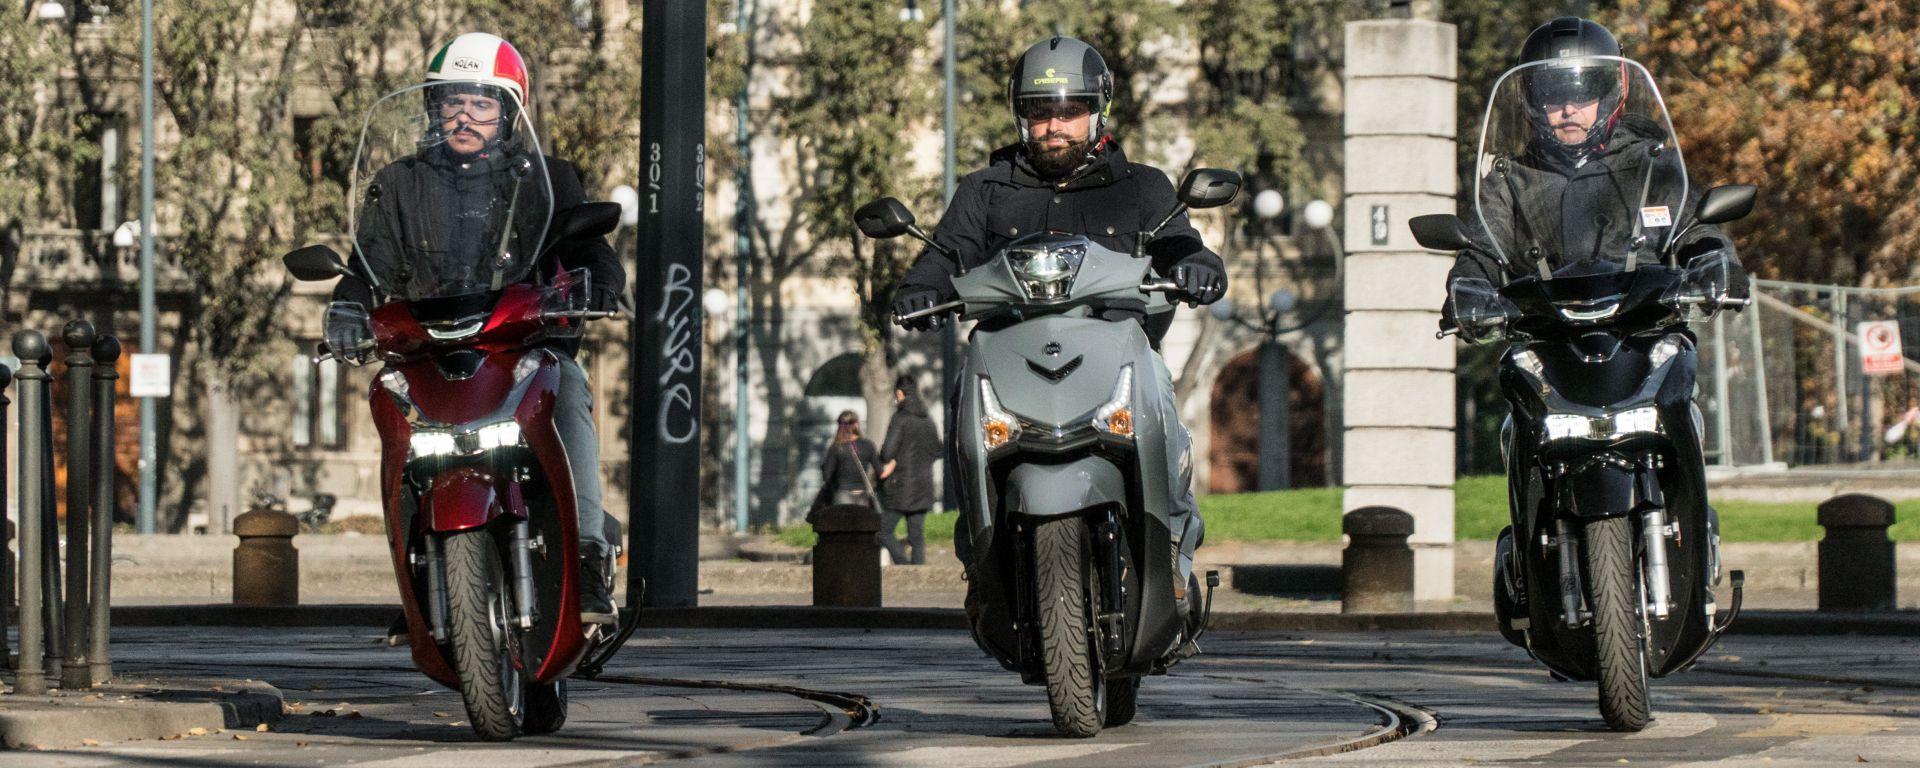 I 10 scooter più venduti in Italia